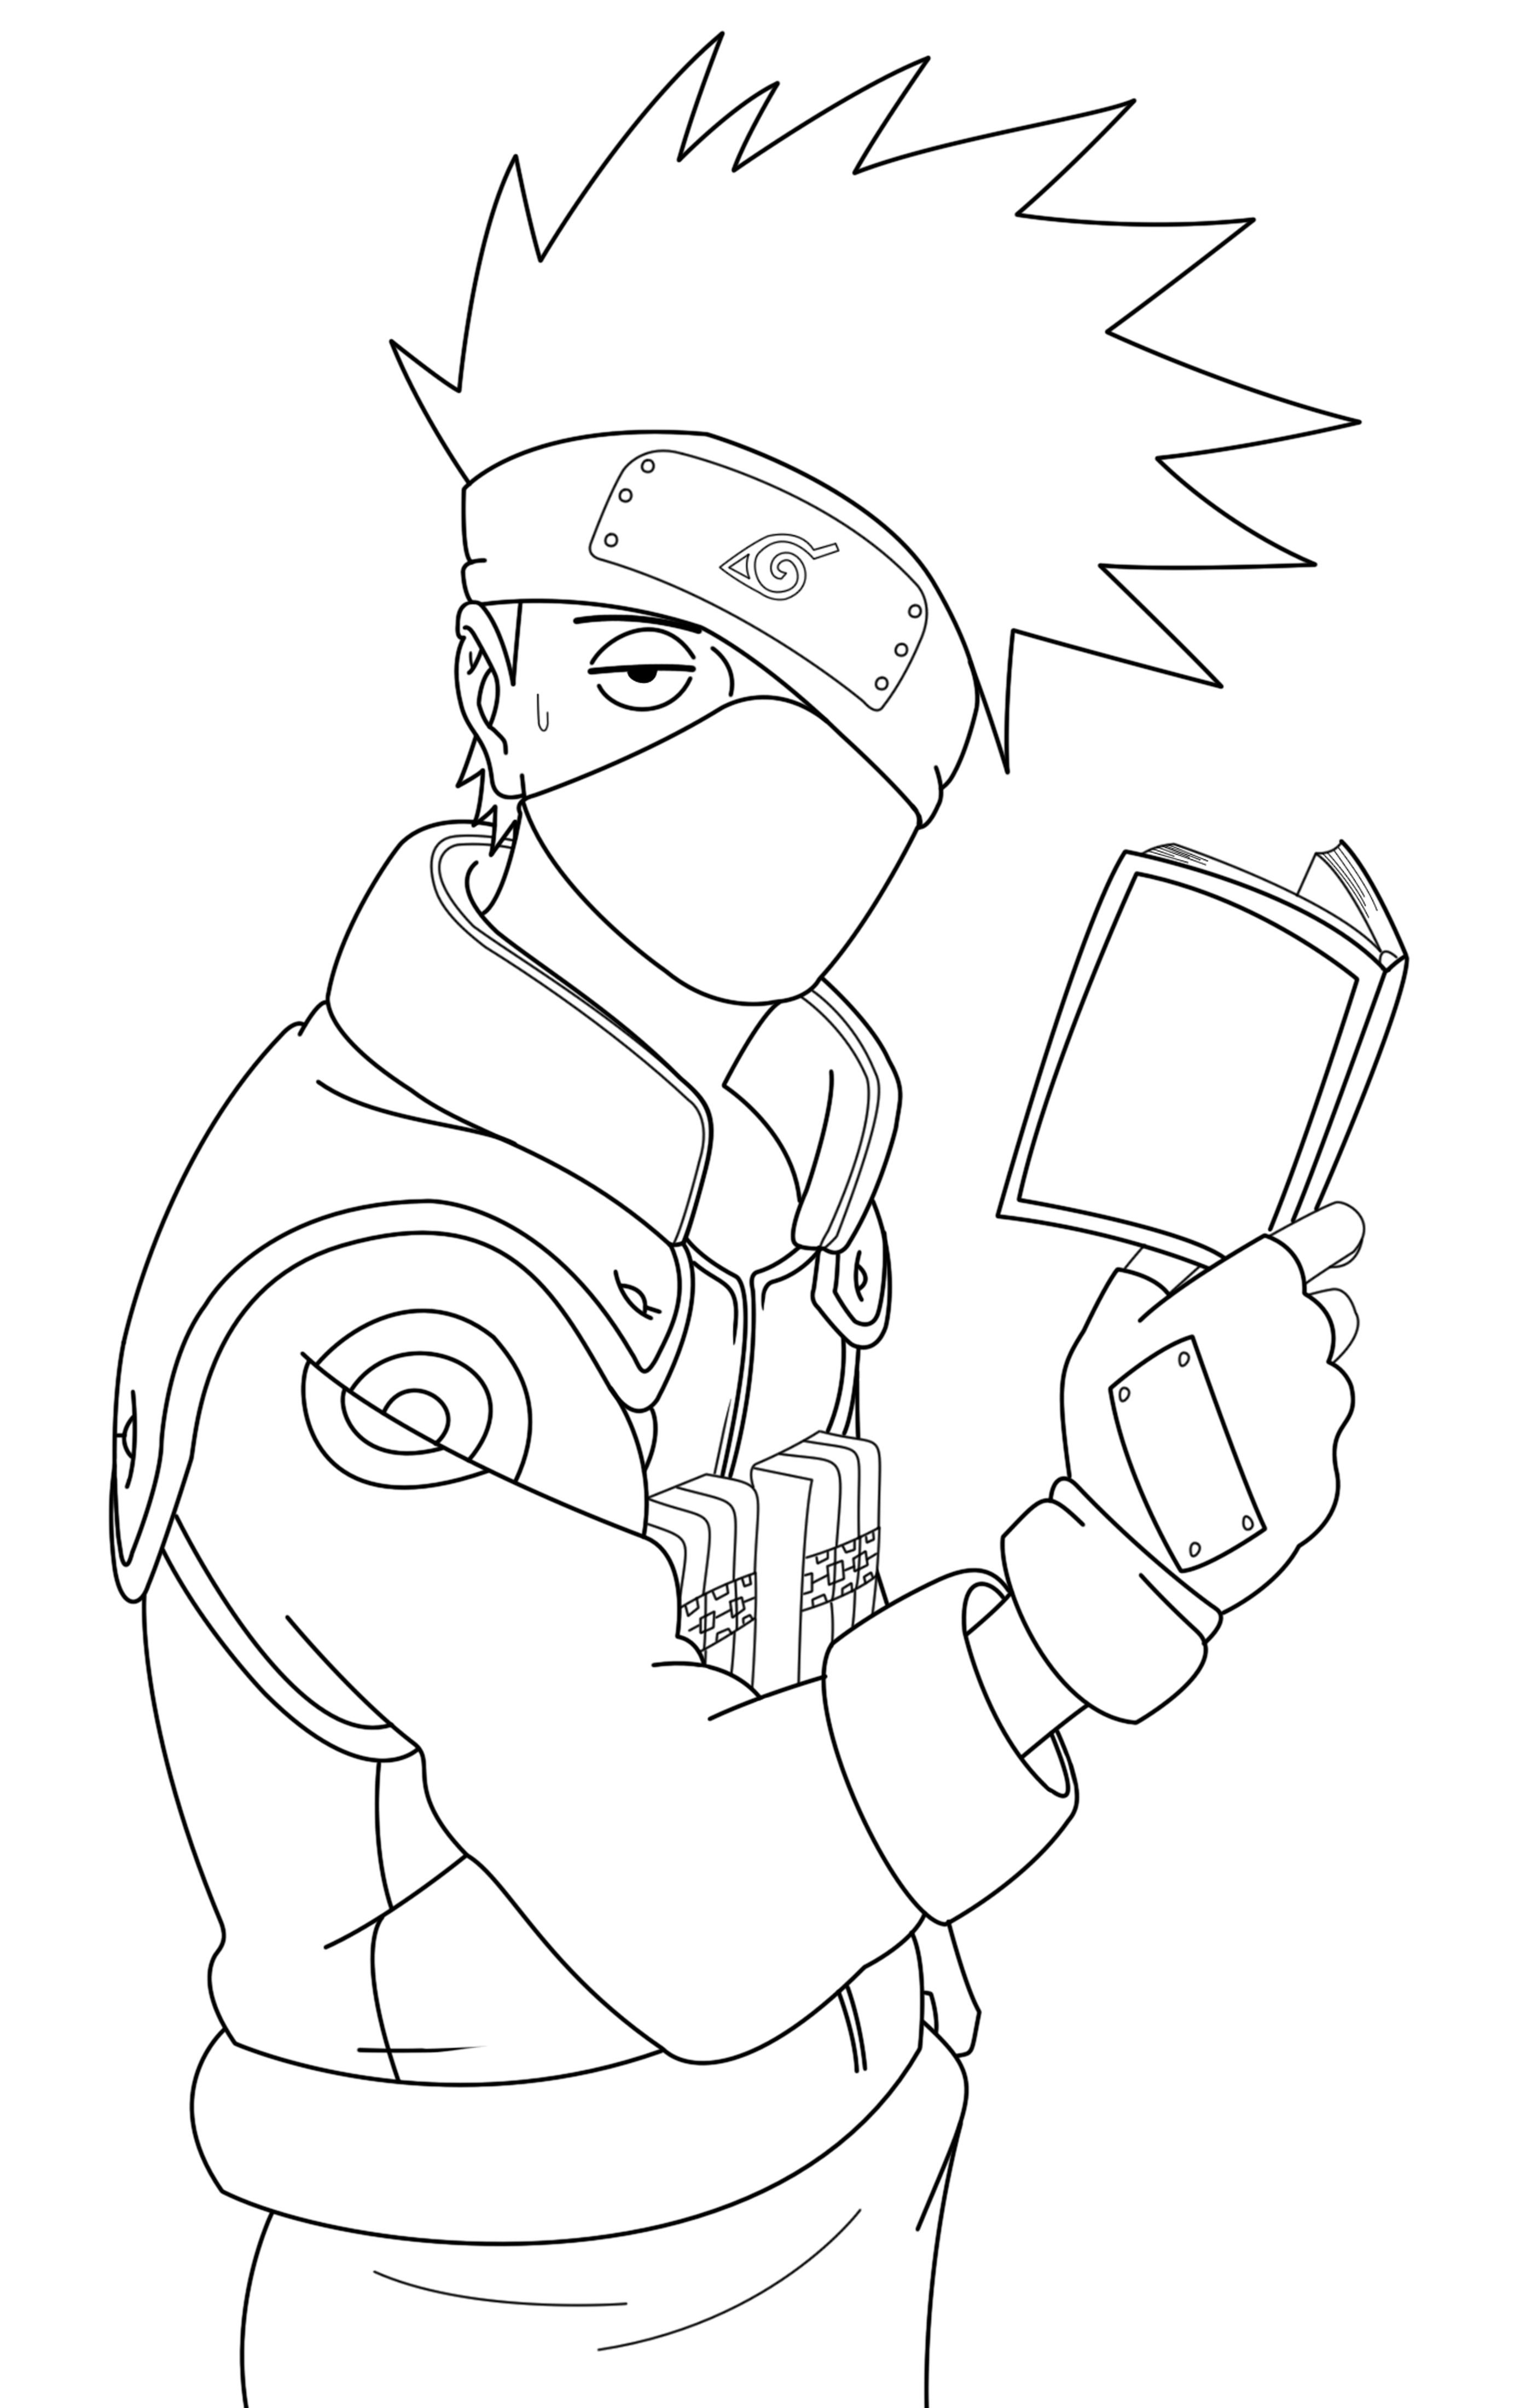 Naruto Lineart : Kakashi lineart naruto by crazylz on deviantart